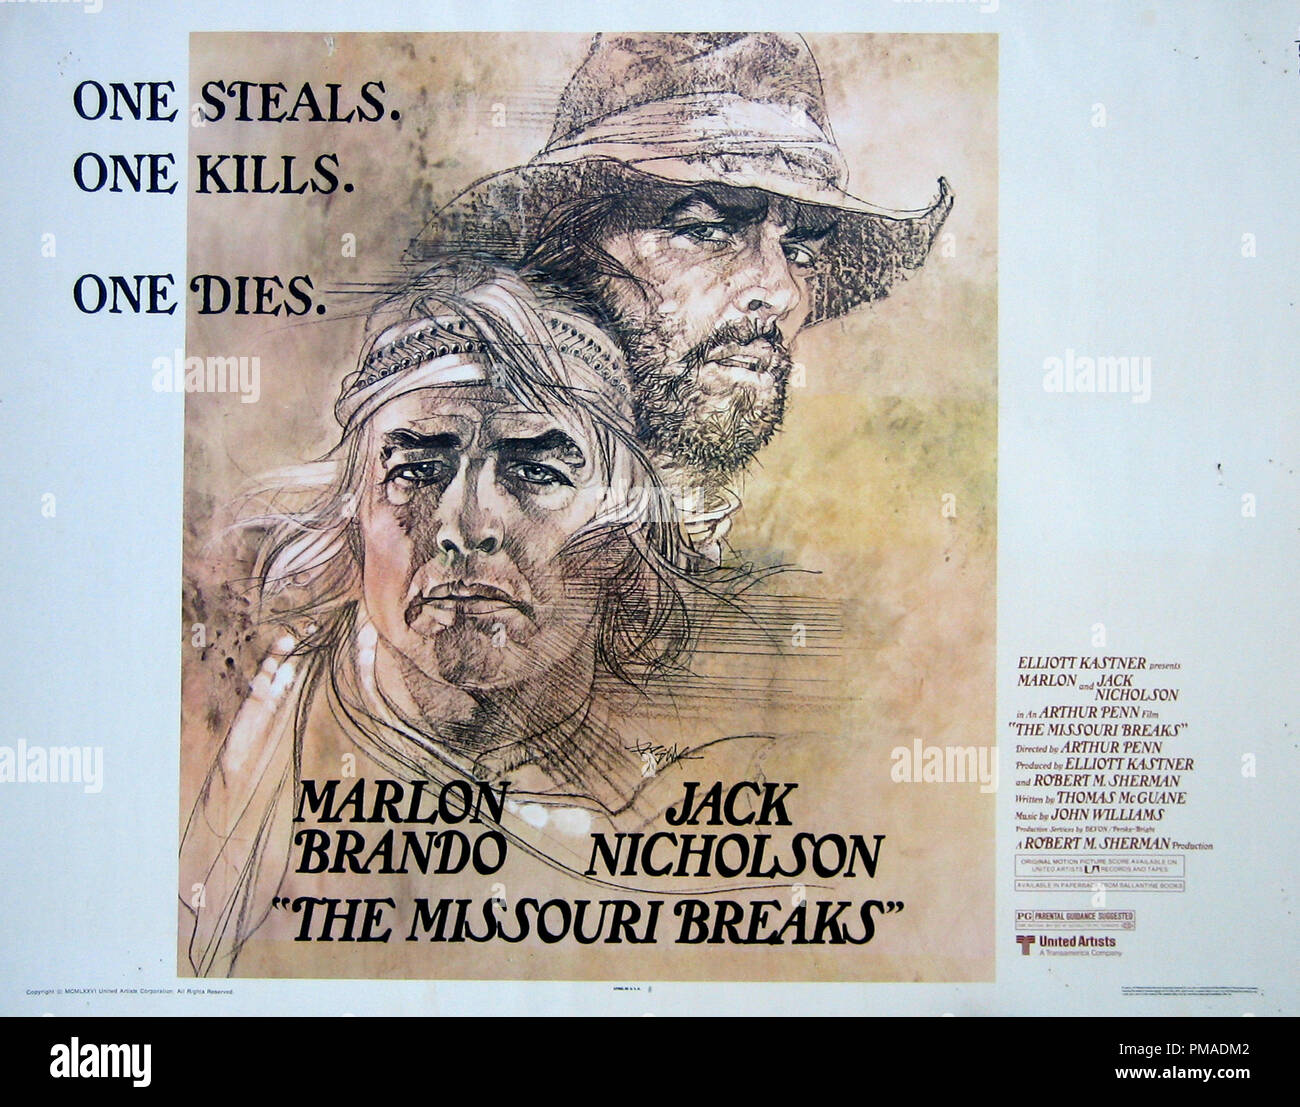 'The Missouri Breaks' - US Poster 1976 United Artists  Marlon Brando, Jack Nicholson  File Reference # 32509_249THA - Stock Image